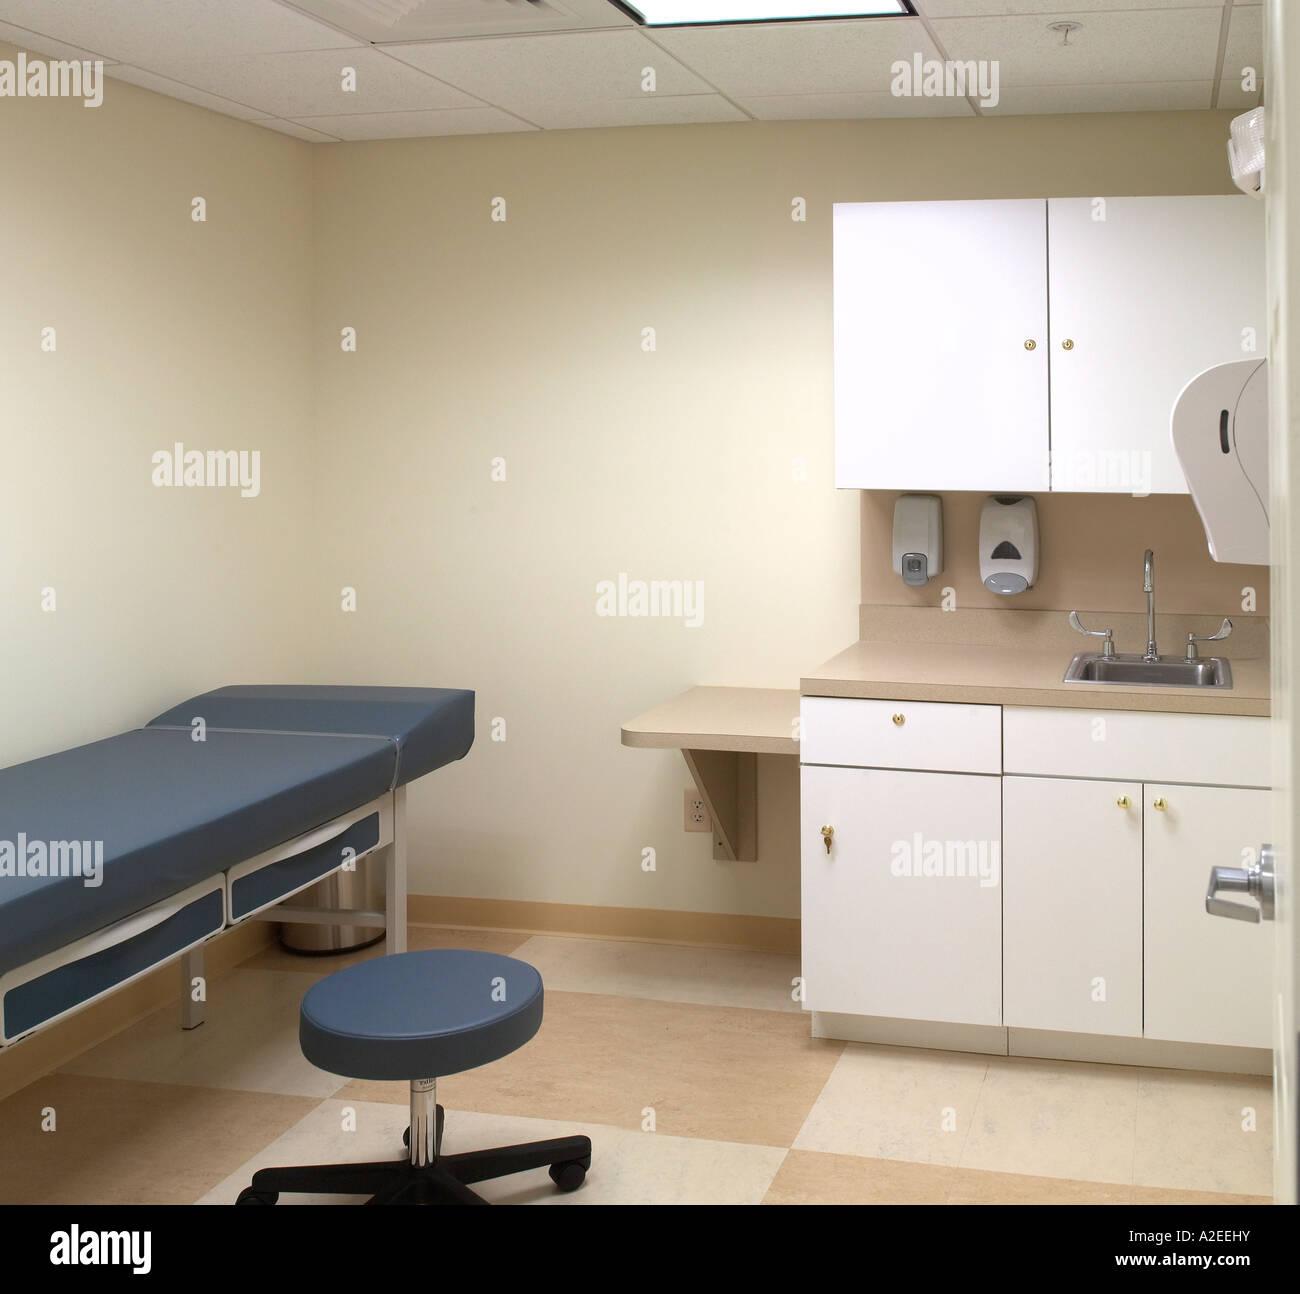 A Doctors Office Exam Room Empty Nobody   Stock Image